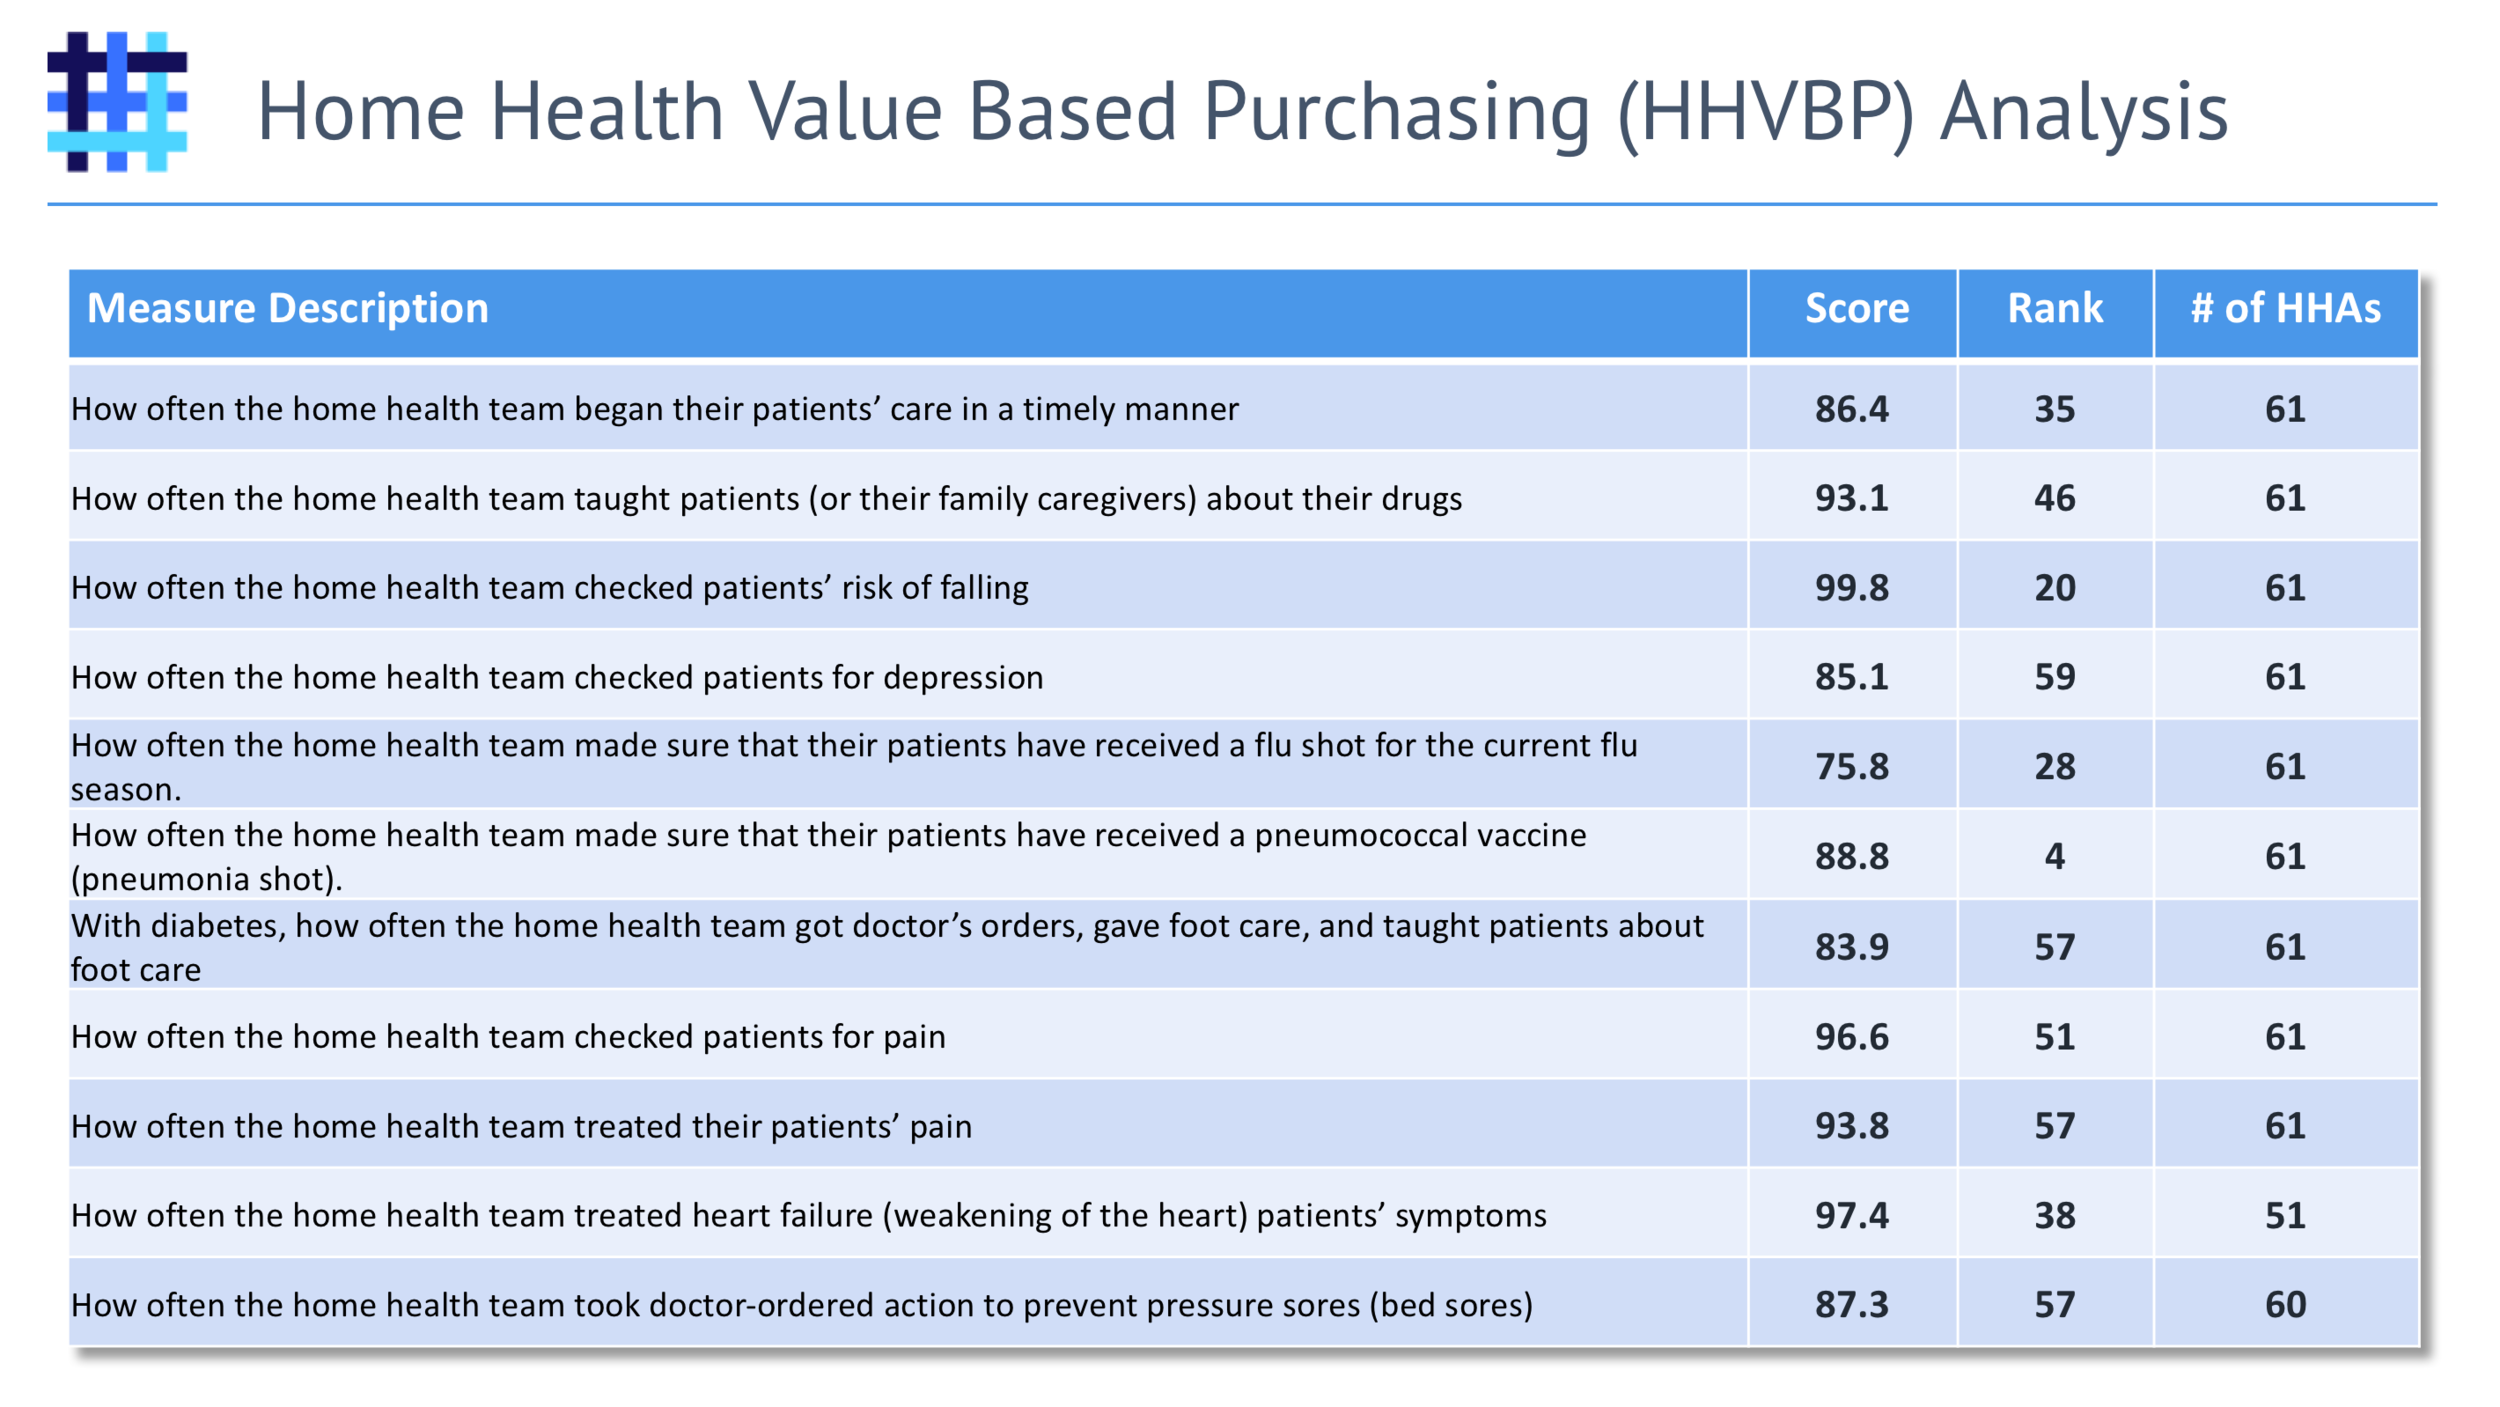 web-hha-medicare-home-health-value-based-purchasing-hhvbp-1.png